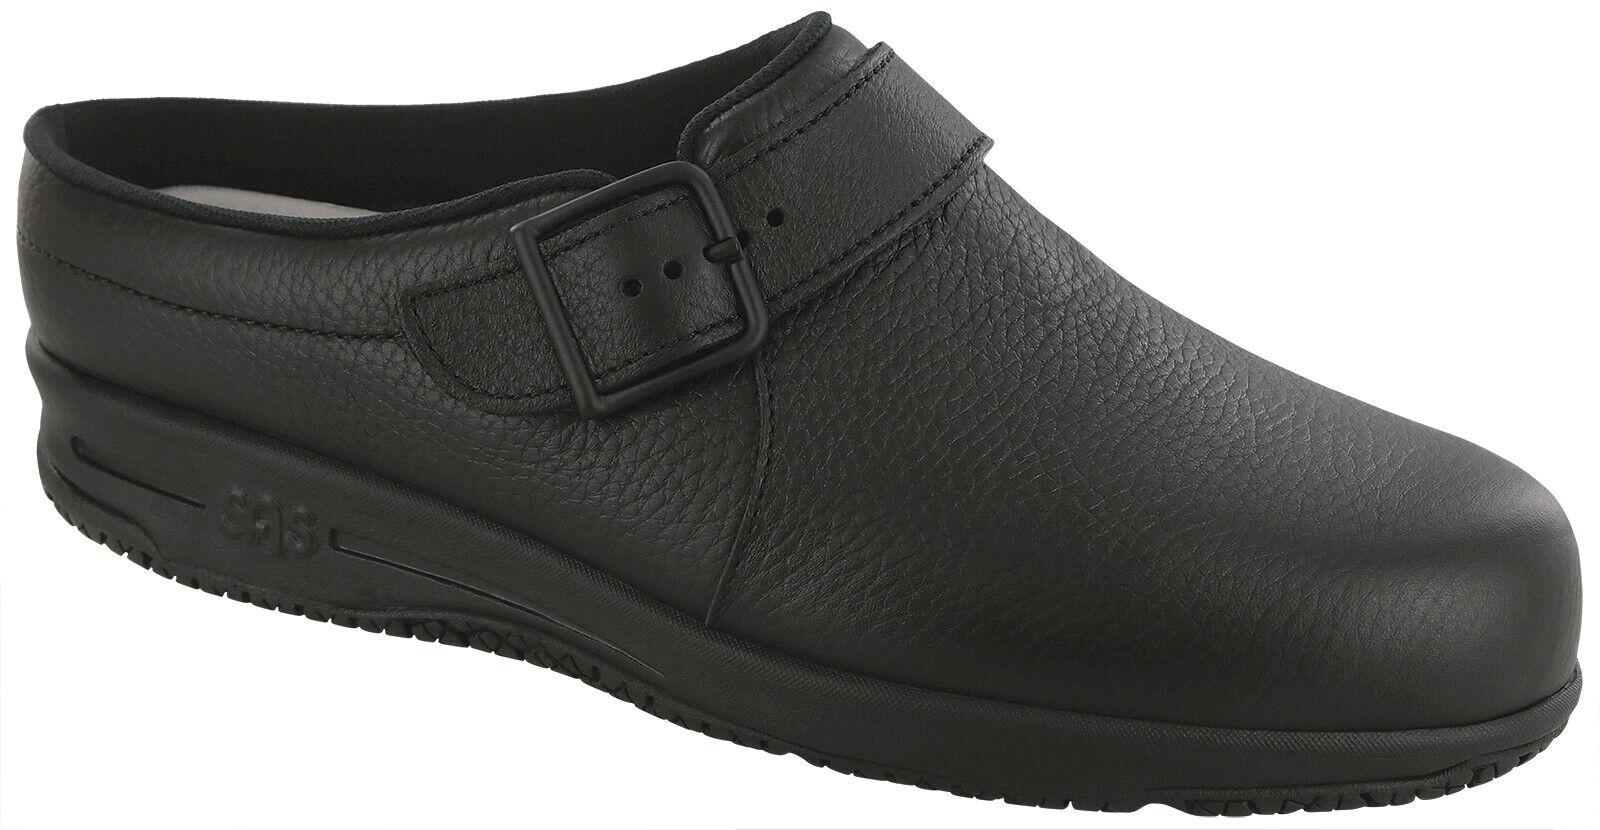 SAS Women's Shoes Clog Slip-Resistant Black 10.5 WW Double Wide FREE SHIPPING